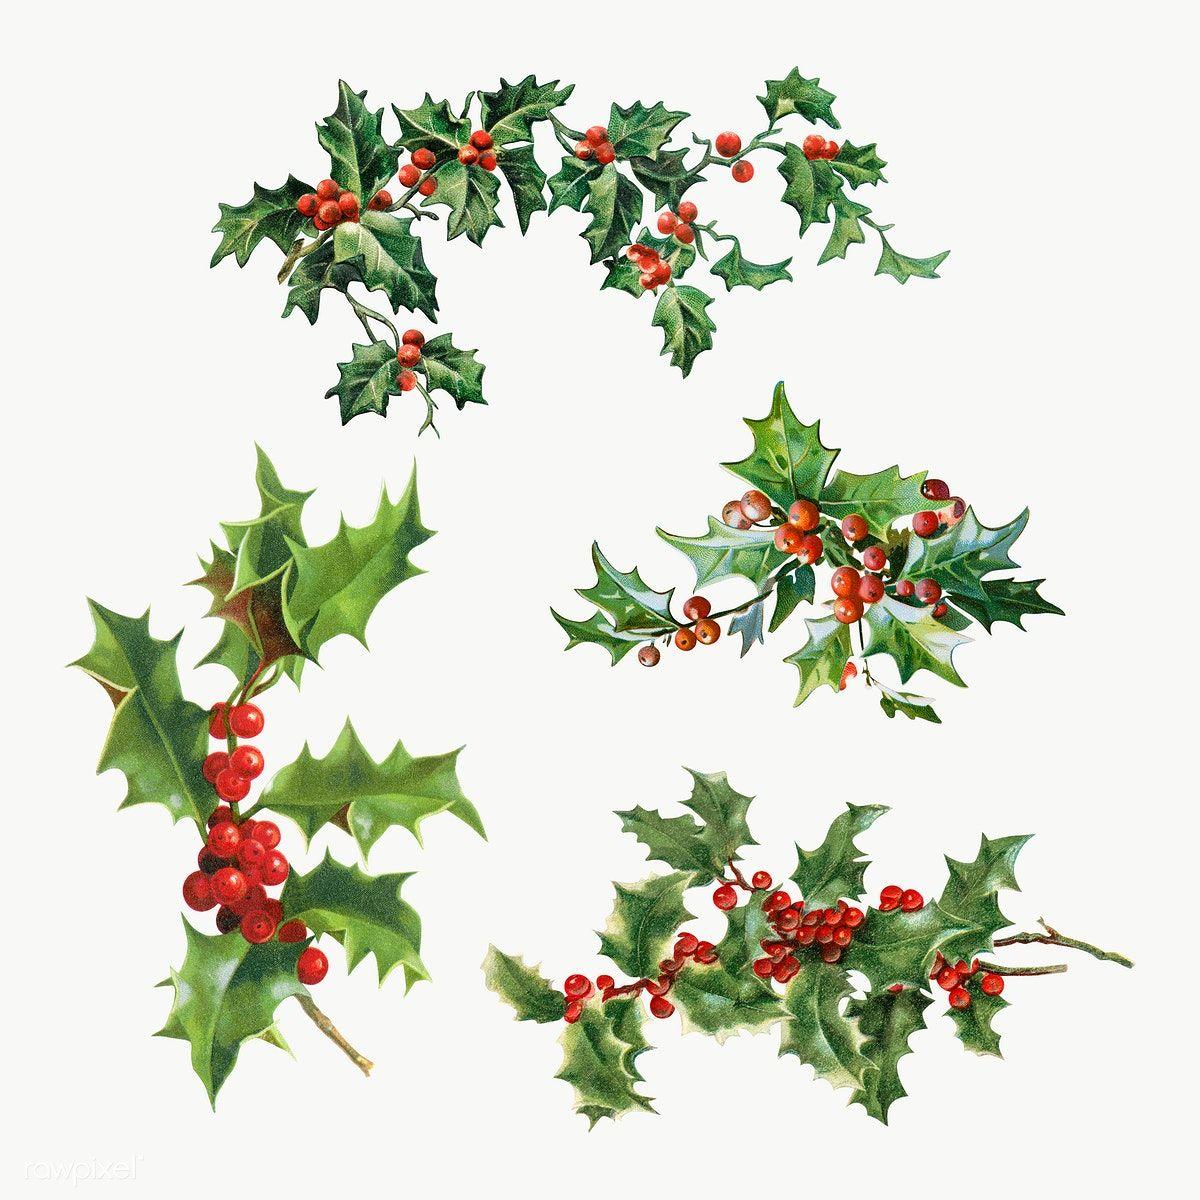 Download Premium Png Of Festive Holly Leaves Set Transparent Png 1232744 Desain